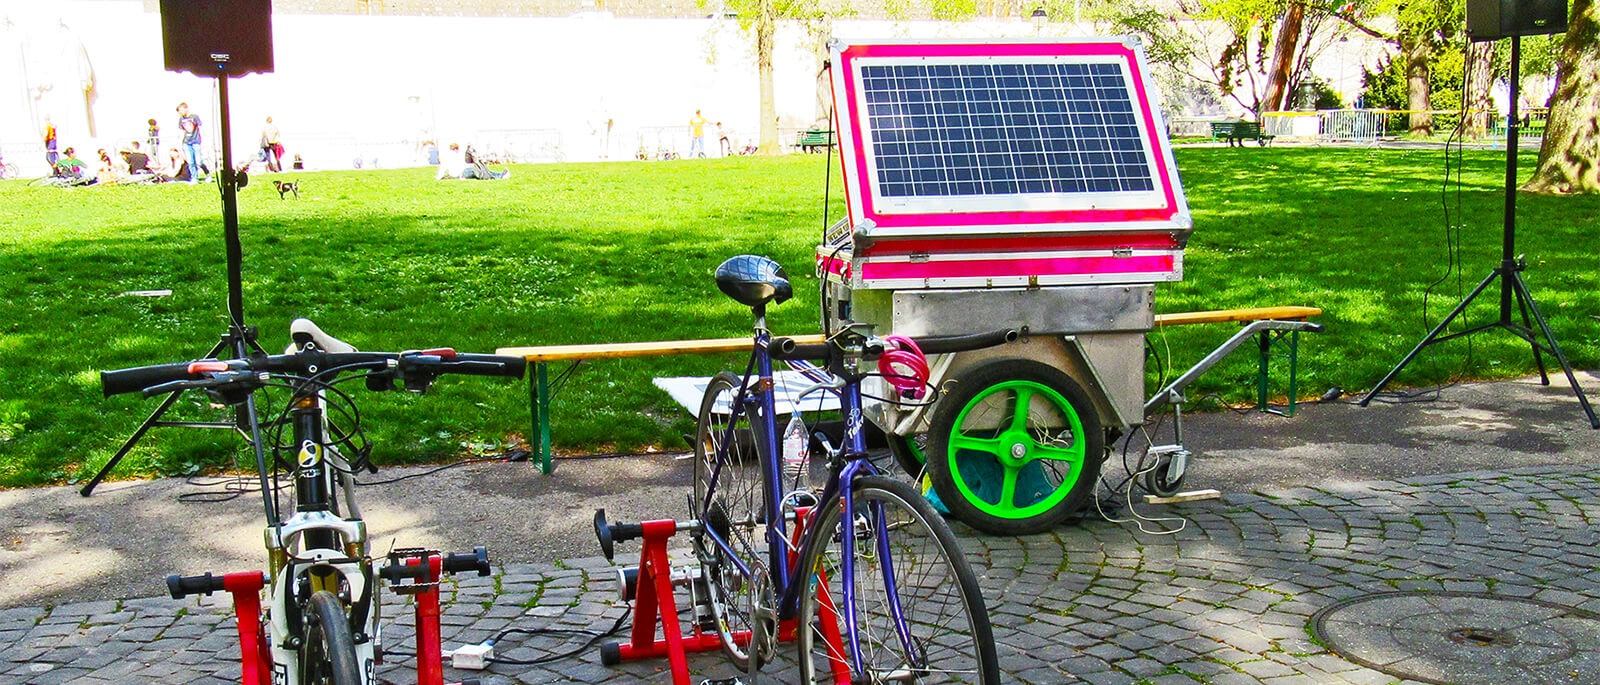 Lausanne.SolarSoundSystem